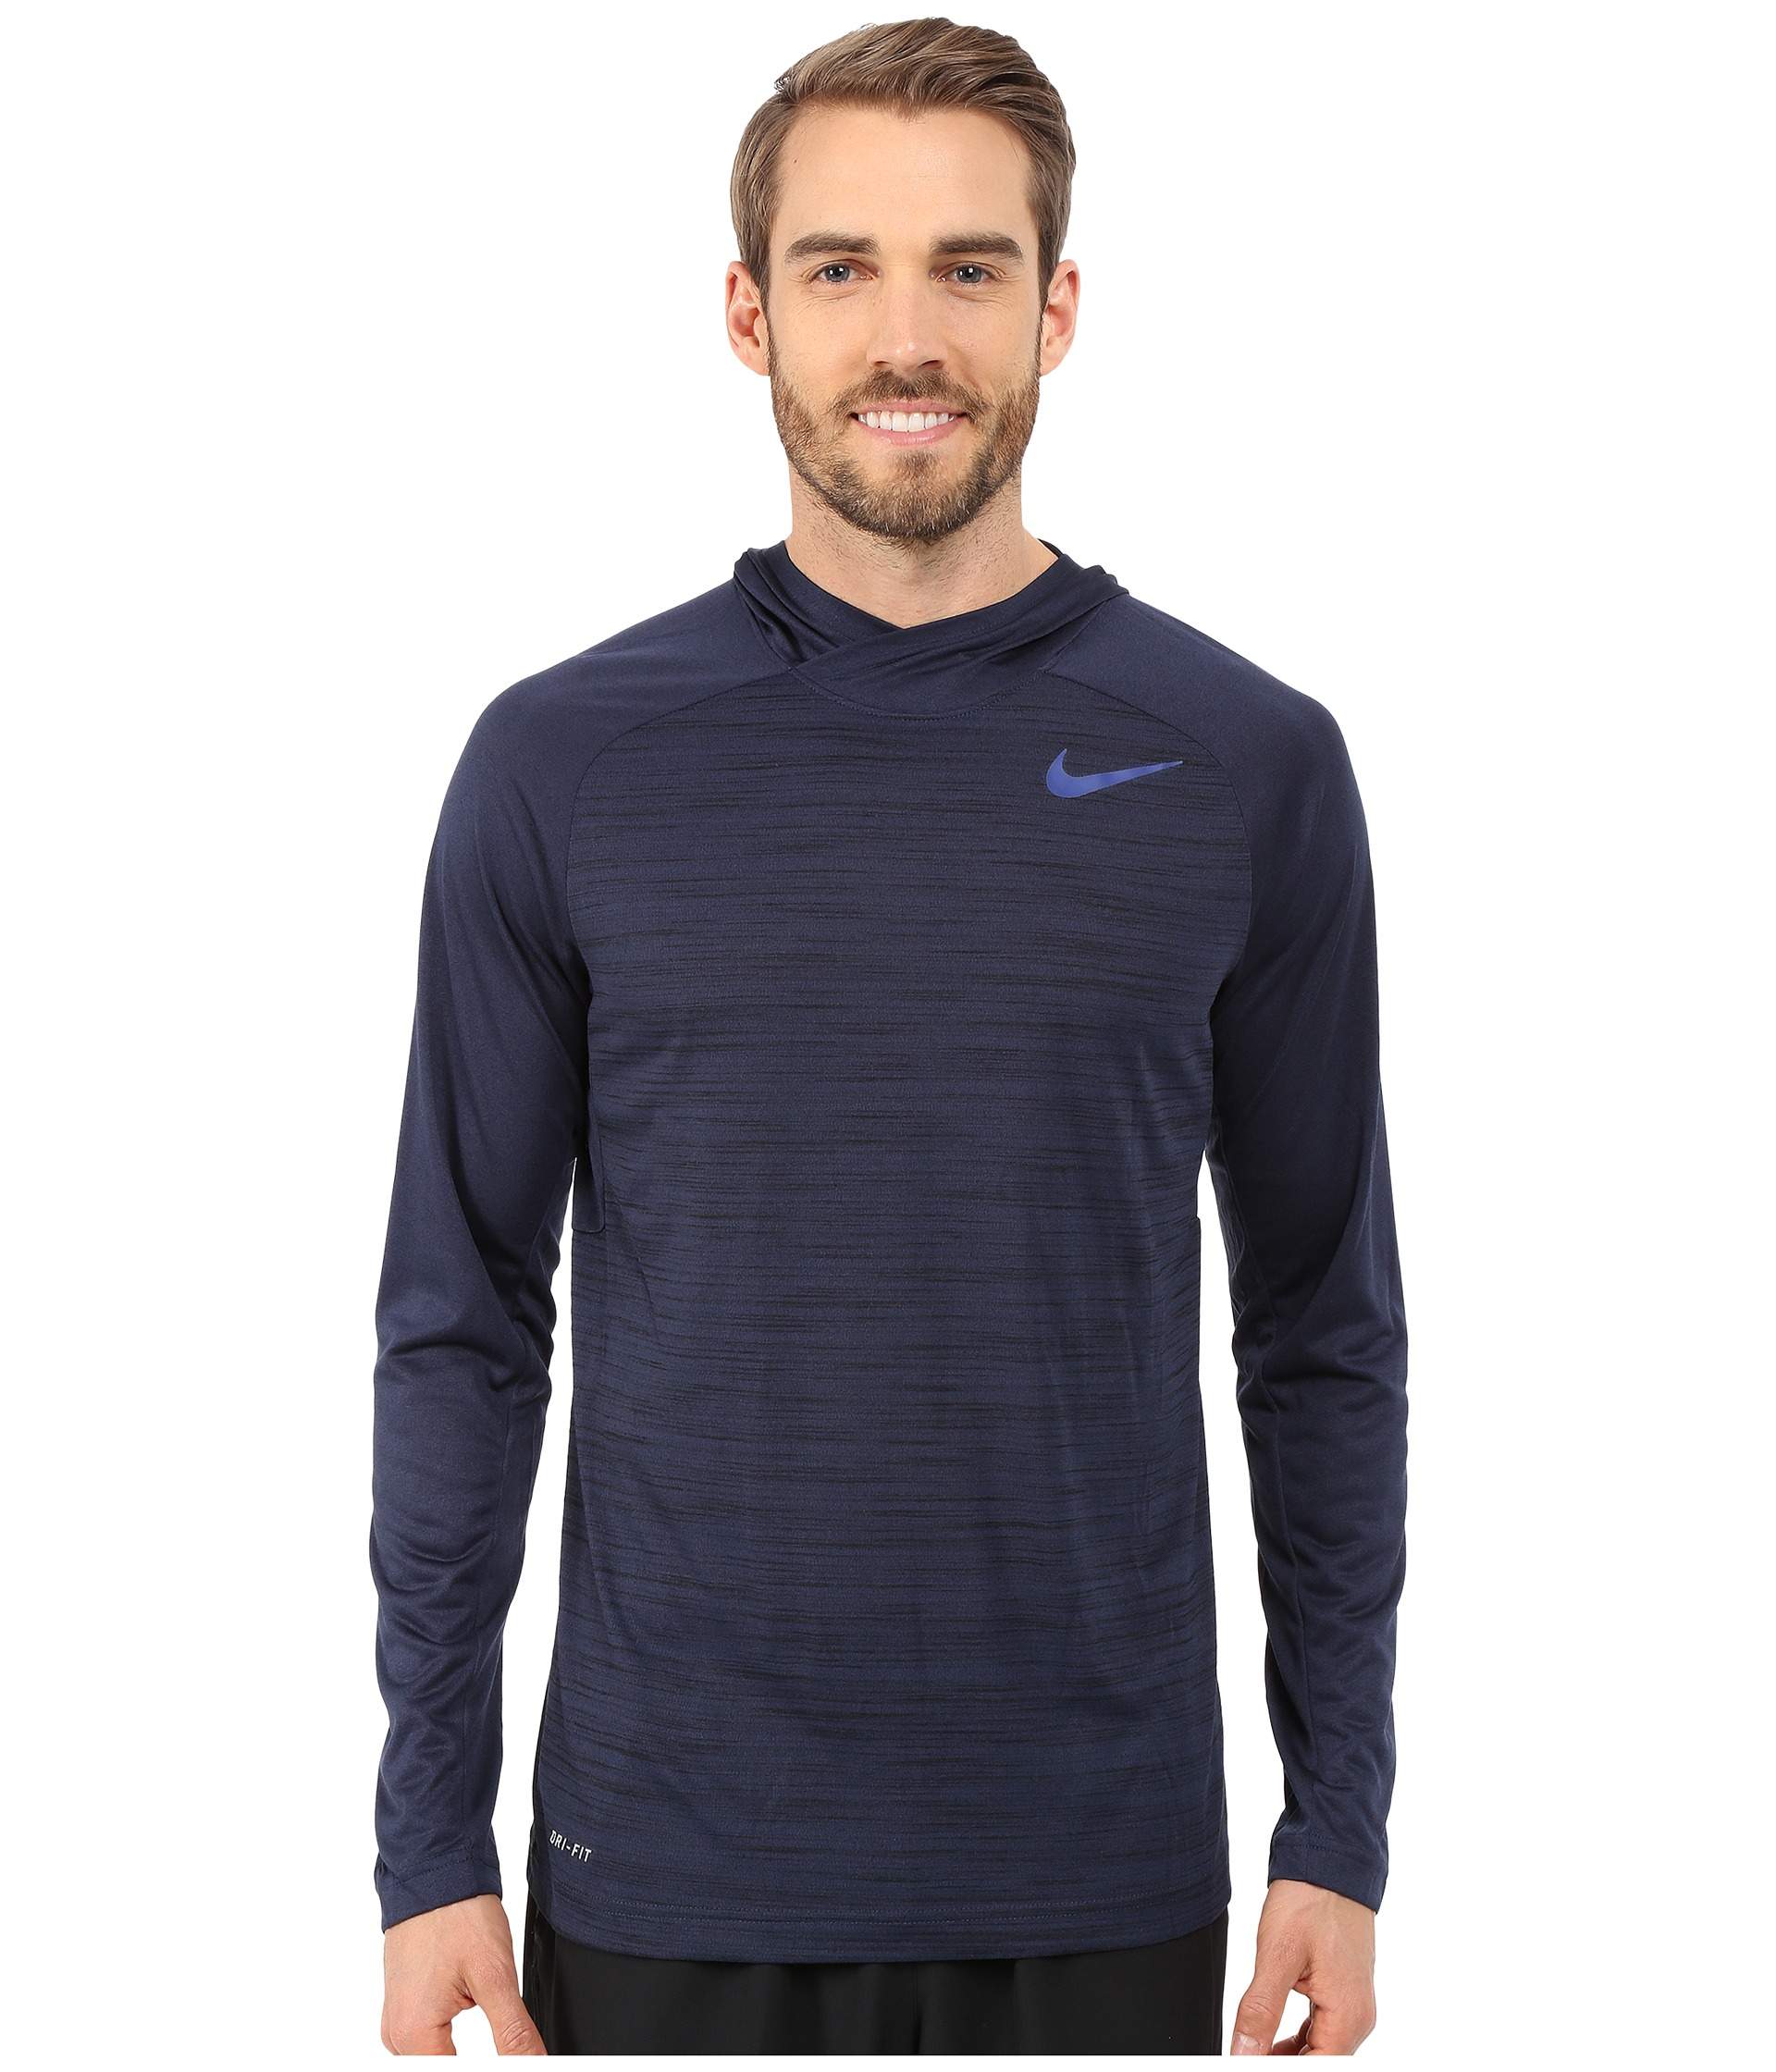 c74e101b Nike Mens Dri Fit Touch Hooded Long Sleeve Shirt - DREAMWORKS